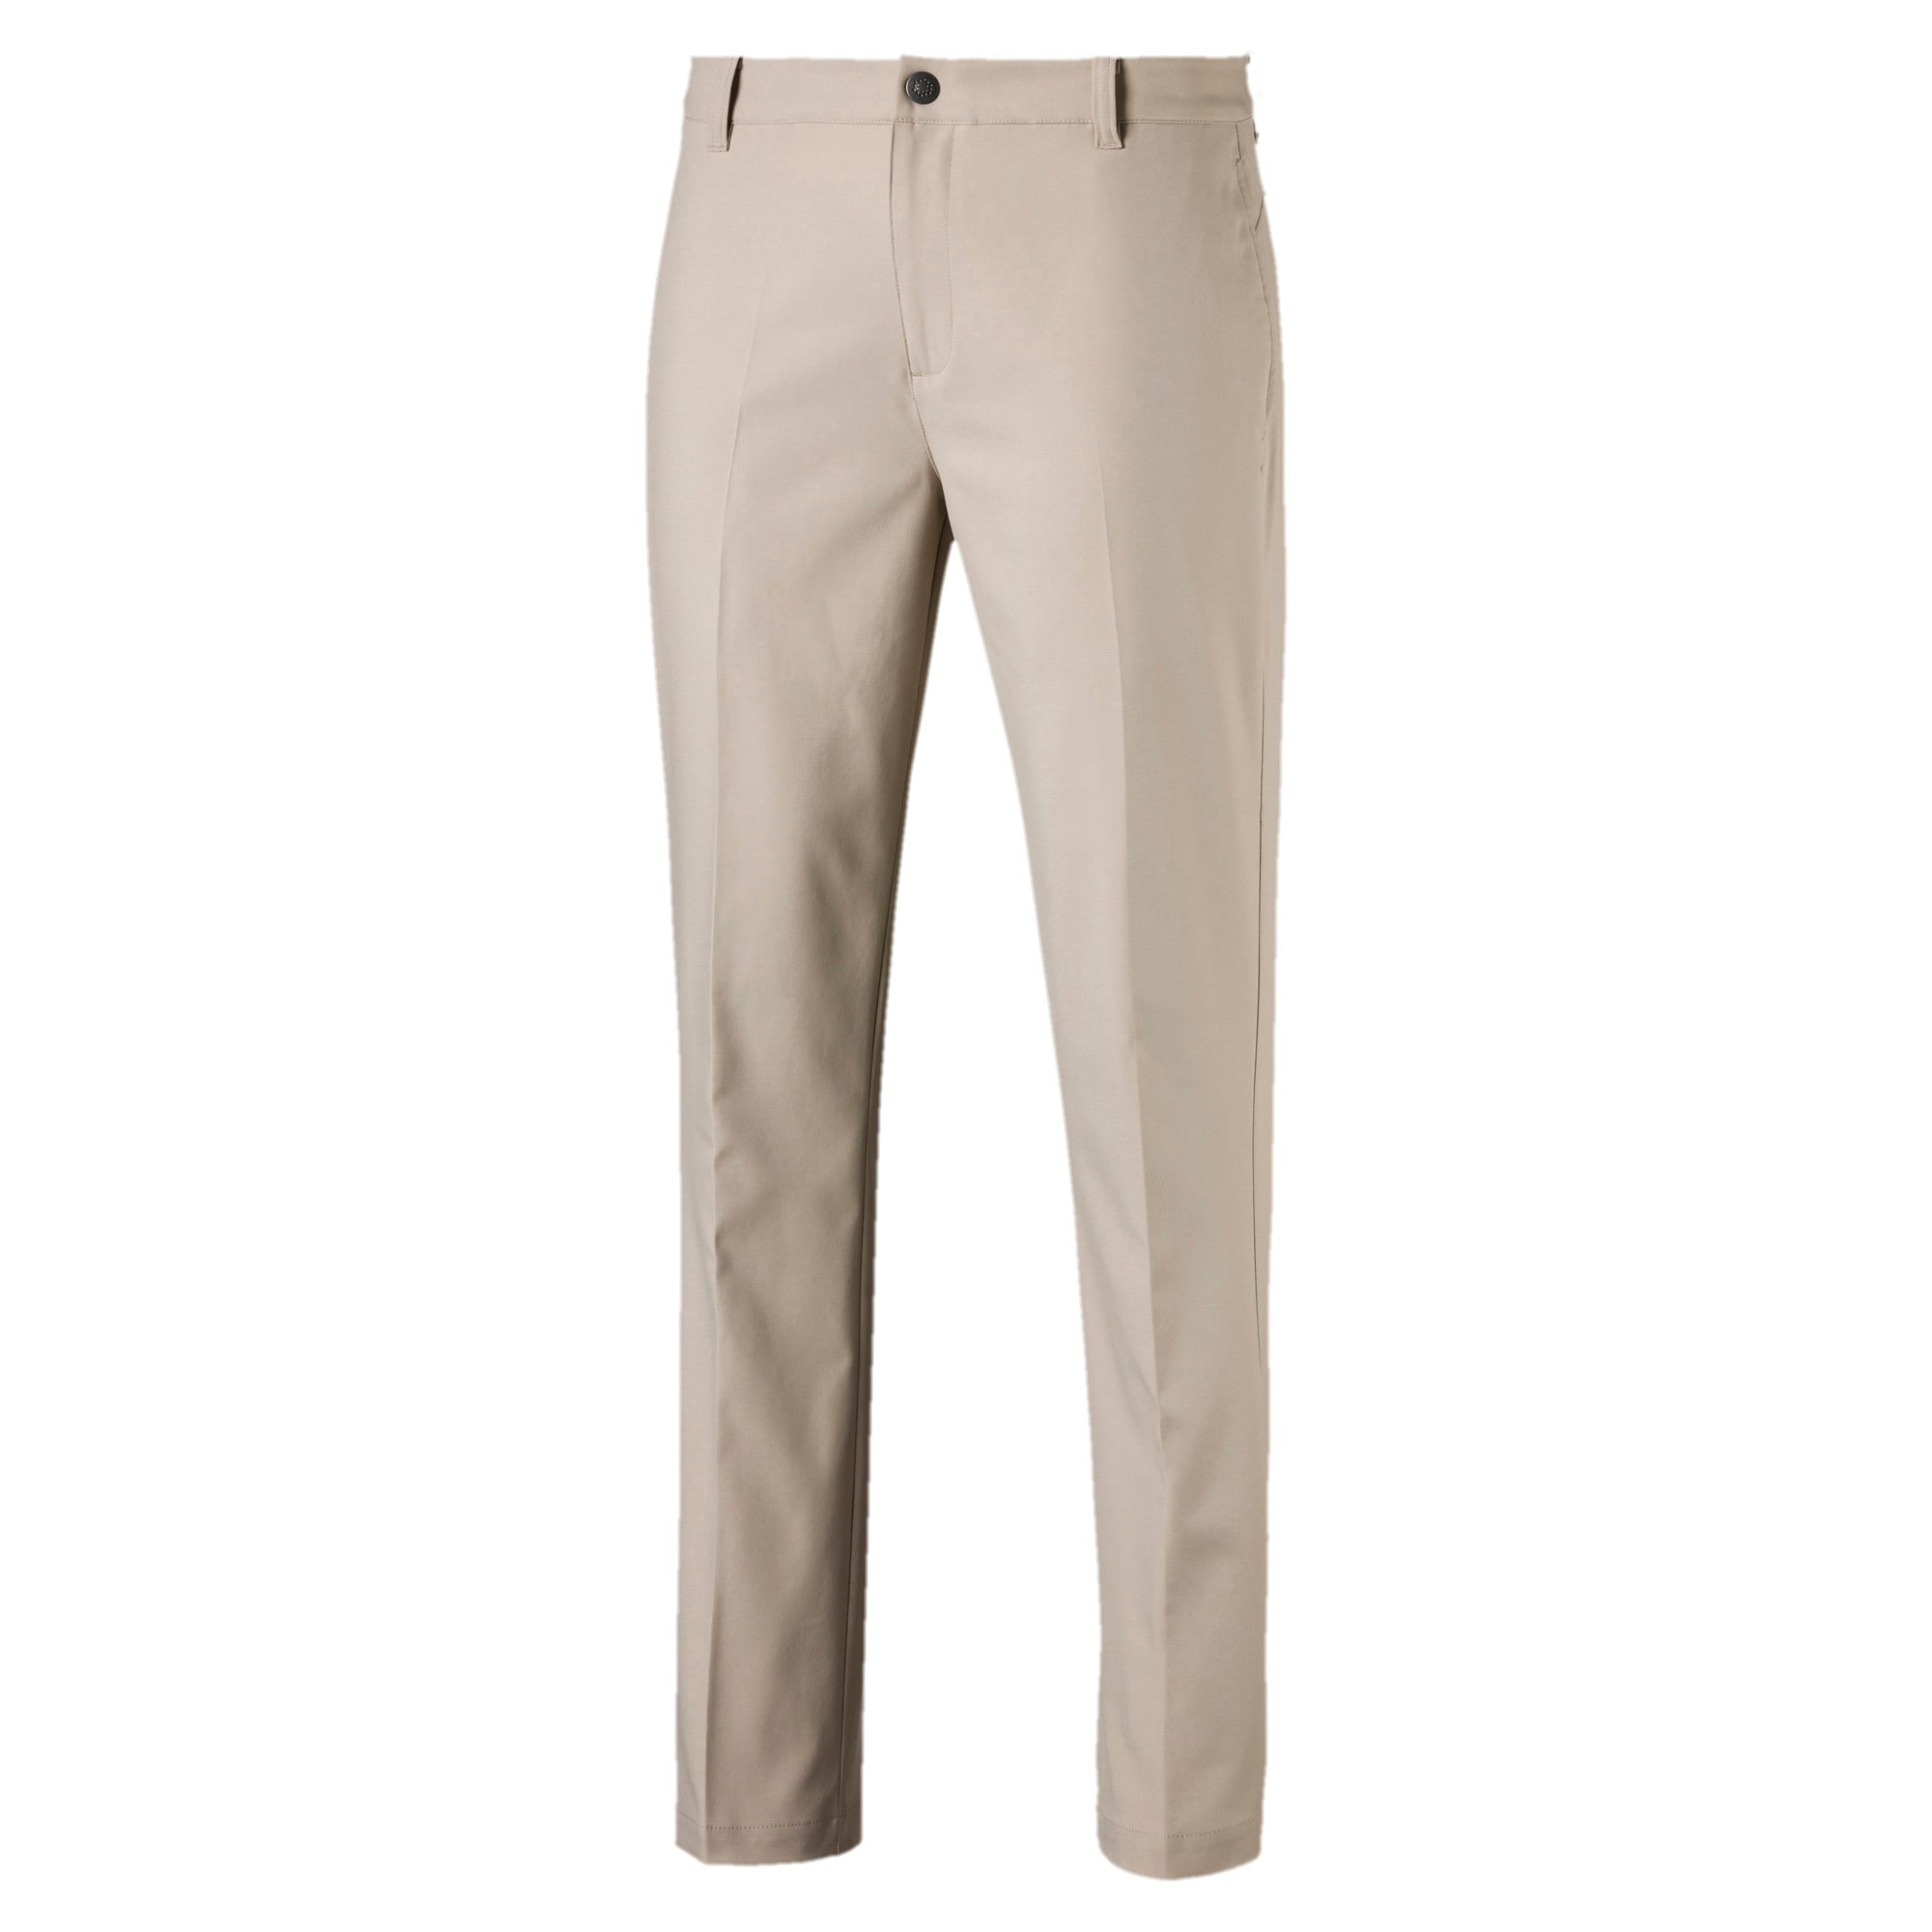 Thumbnail 1 of Jackpot Men's Pants, White Pepper, medium